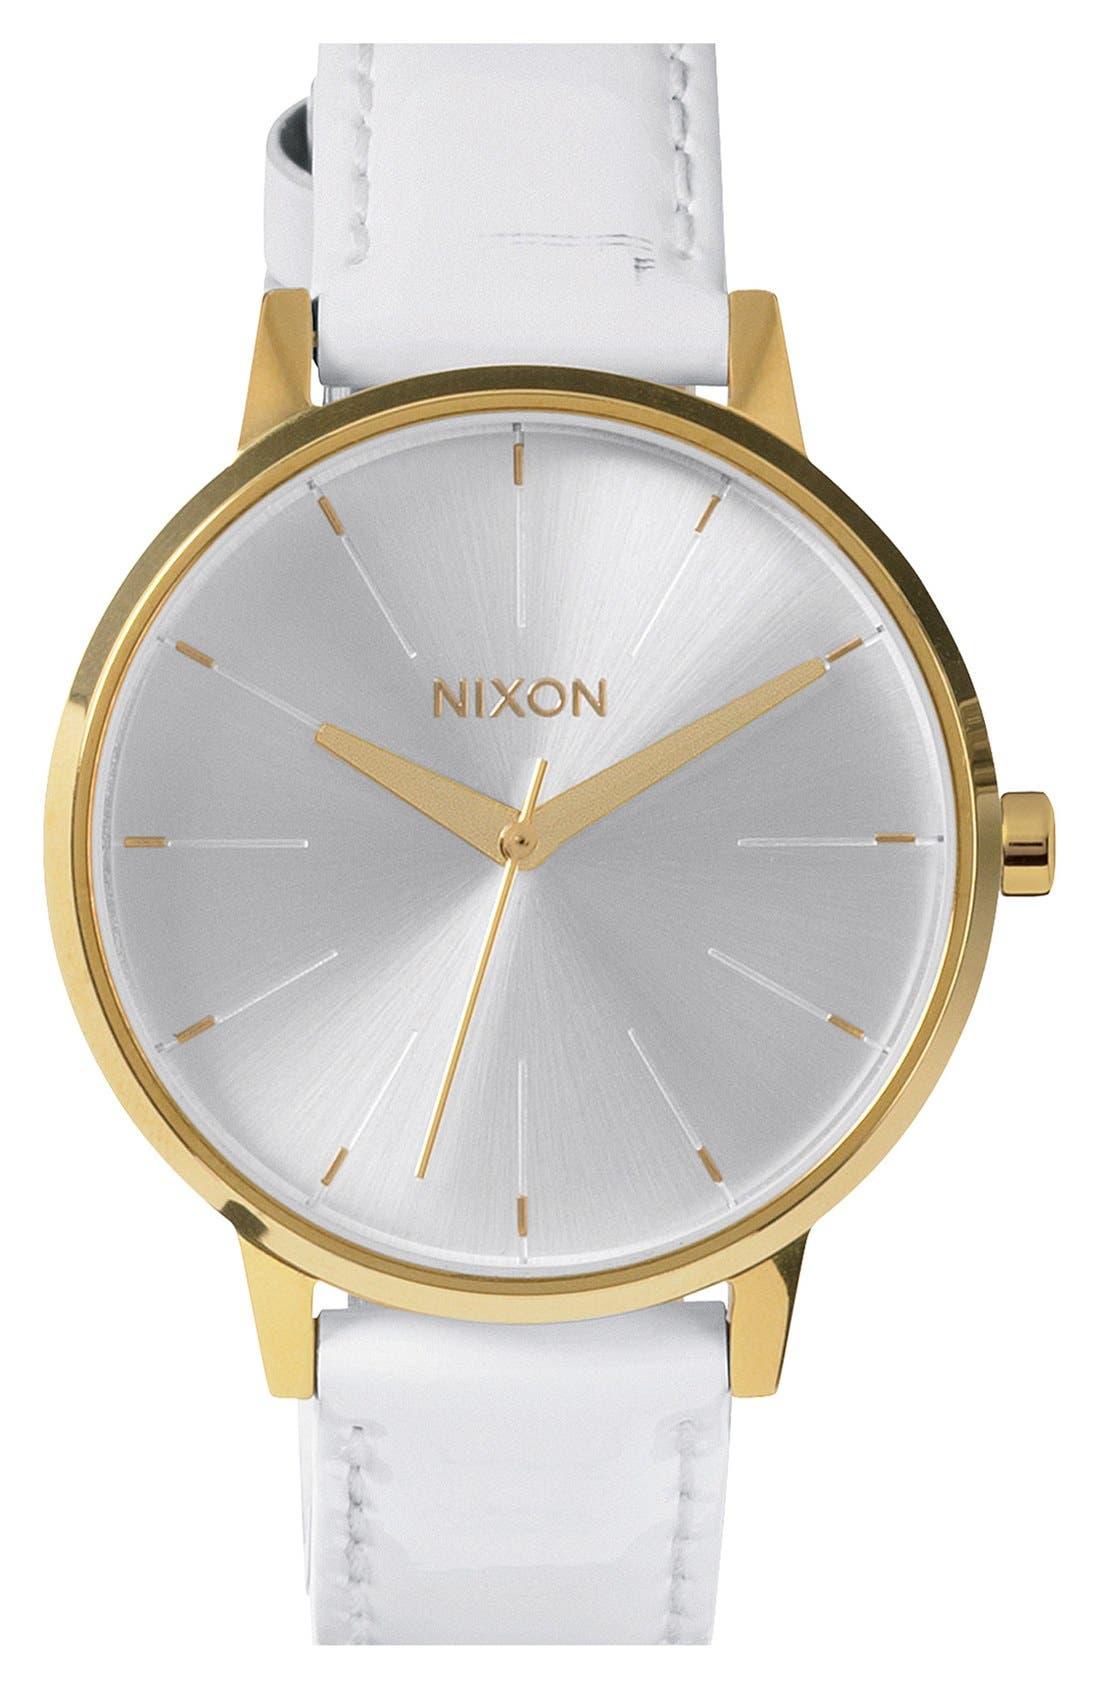 Main Image - Nixon 'The Kensington' Patent Leather Strap Watch, 37mm